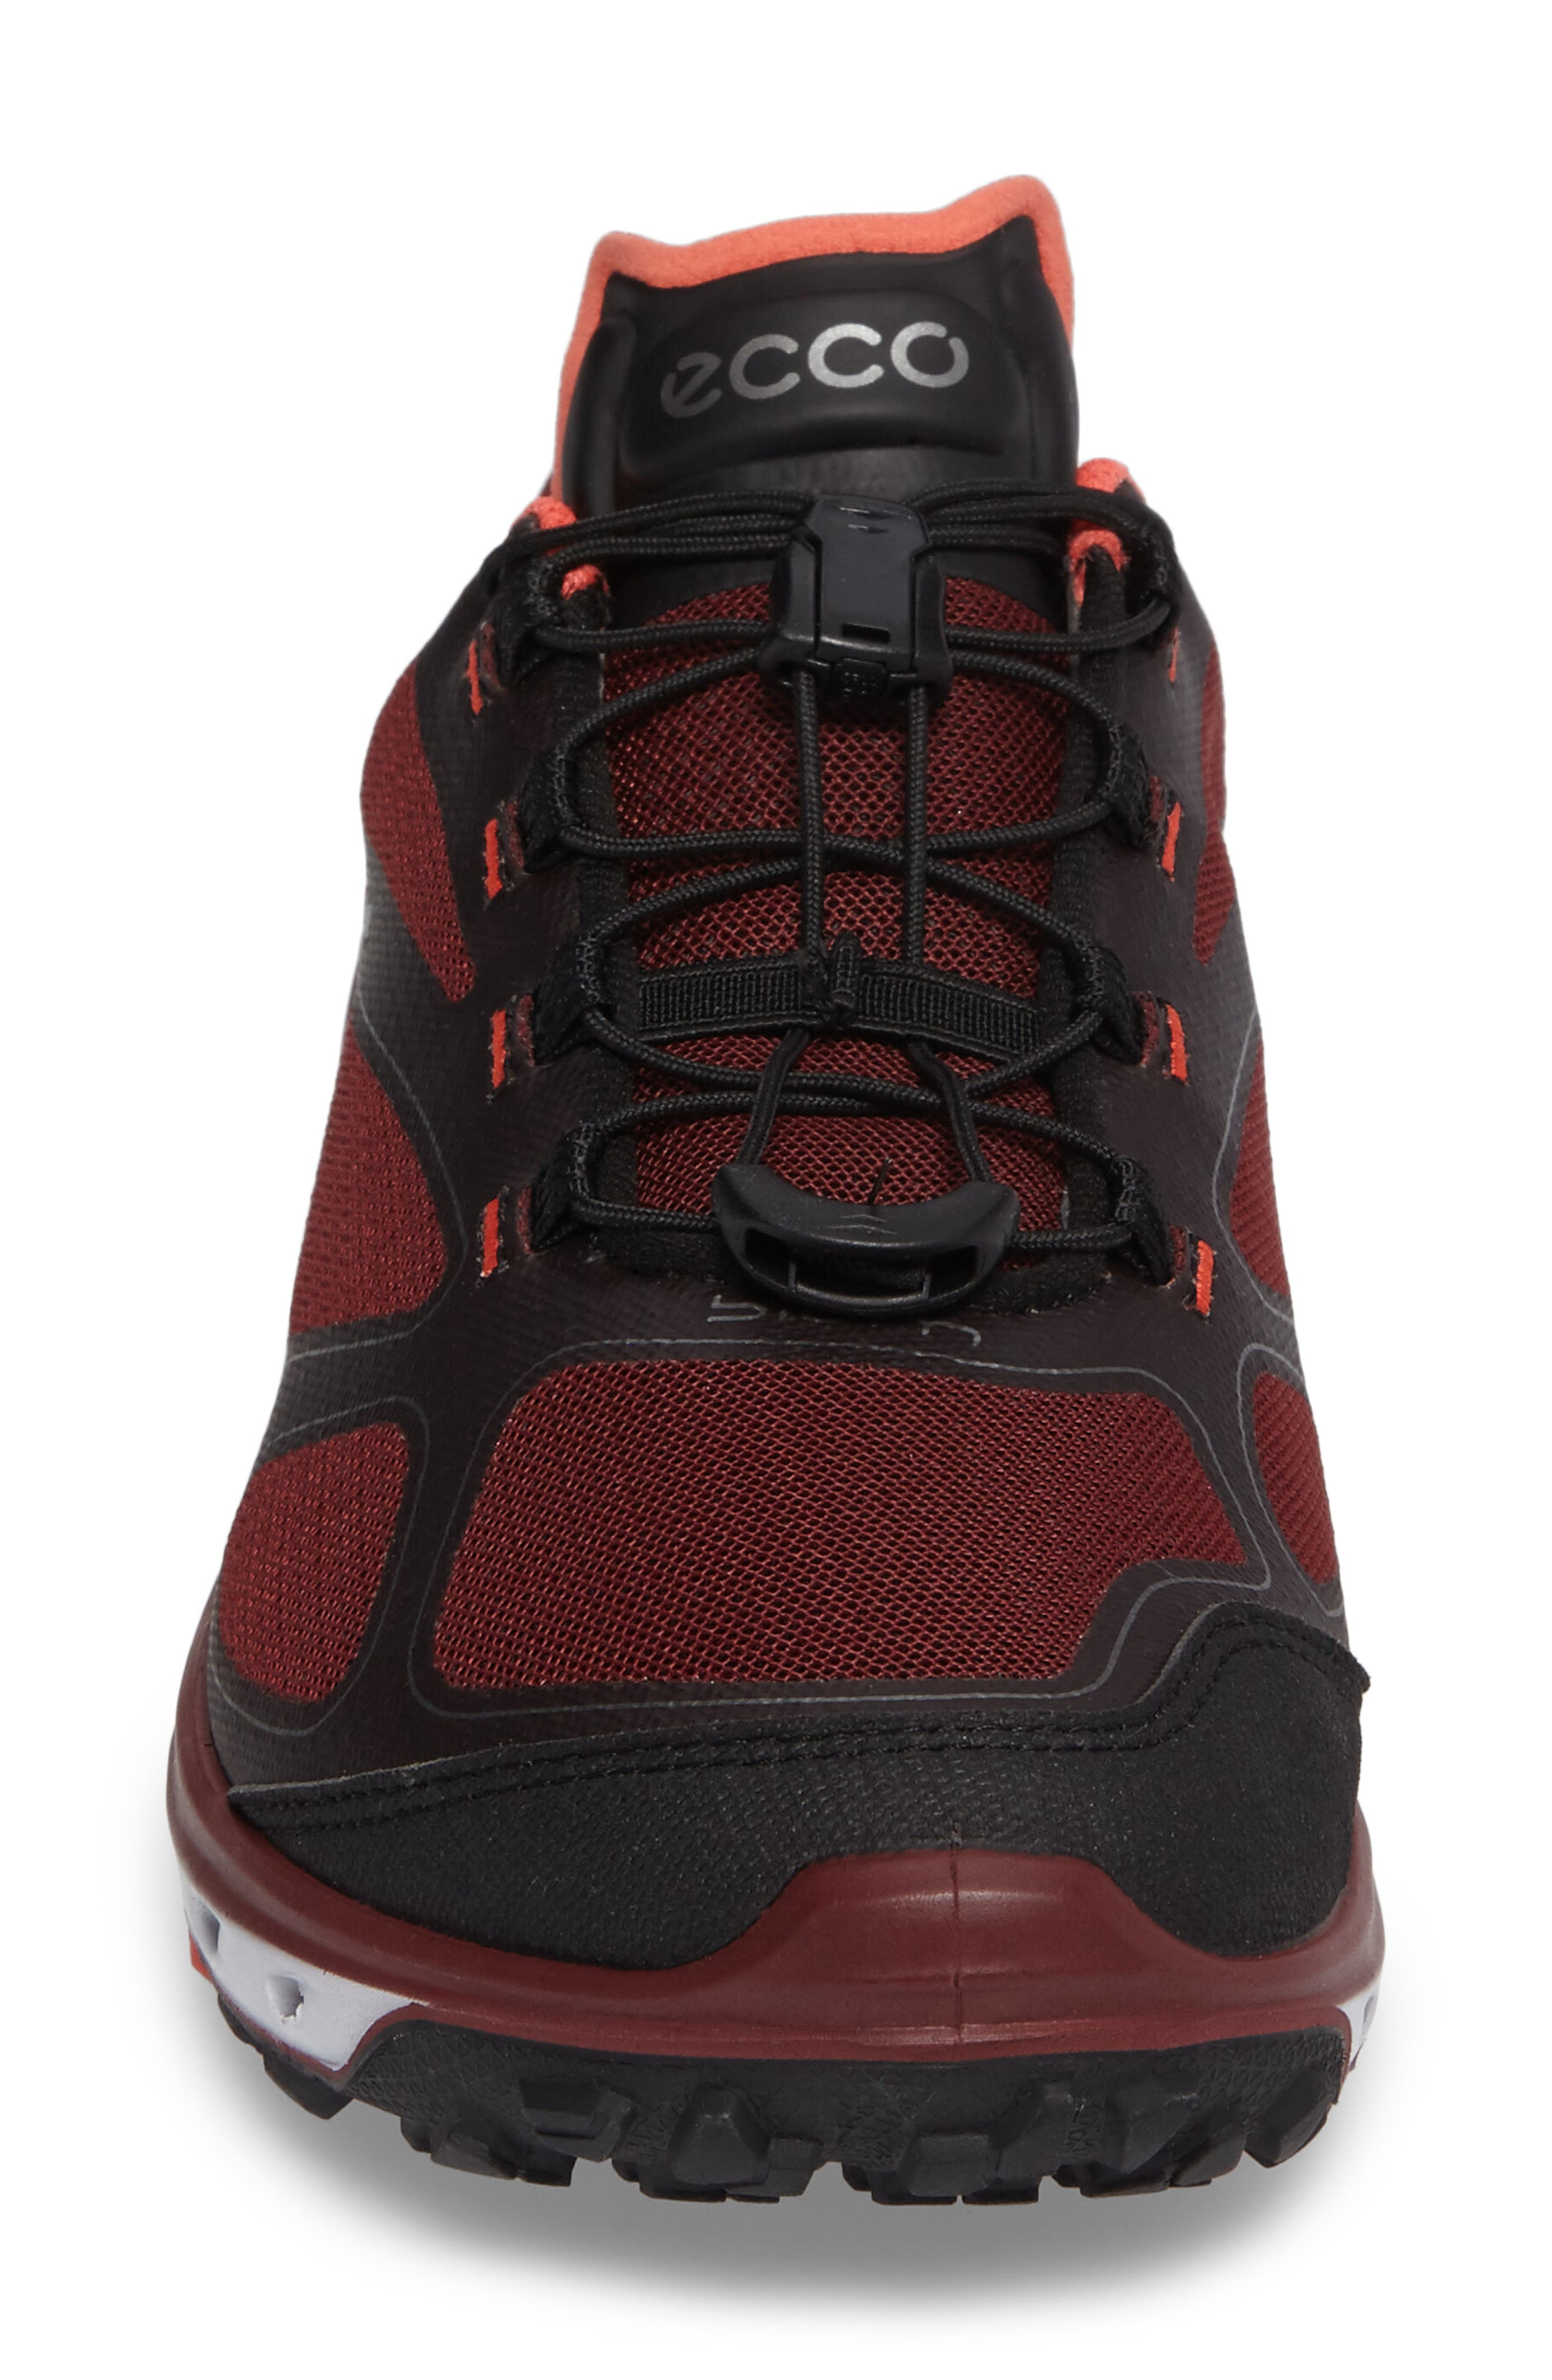 BIOM Venture GTX Sneaker,                             Alternate thumbnail 4, color,                             Black/ Coral Blush Fabric